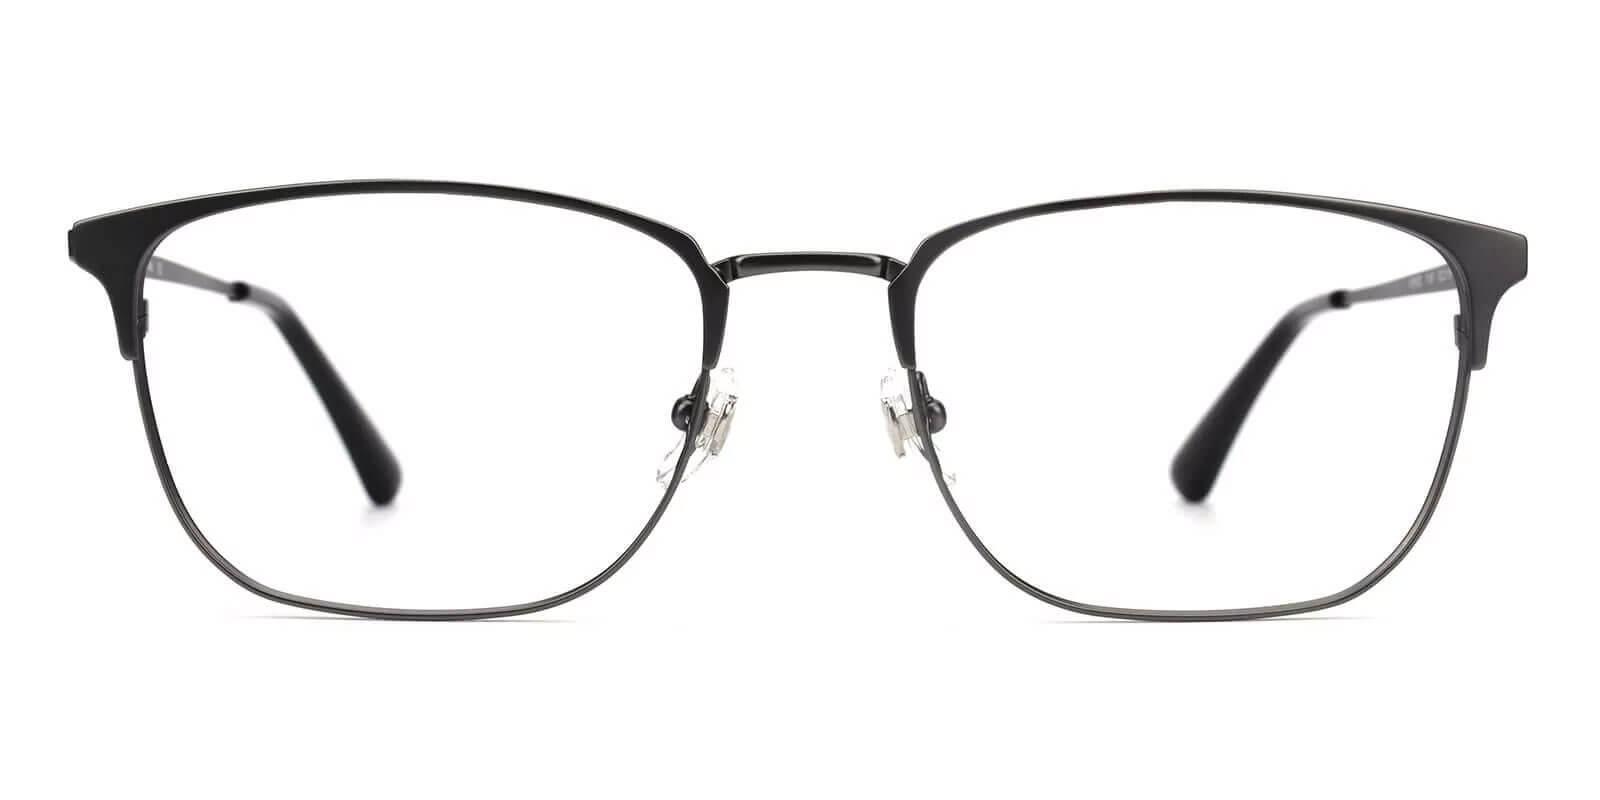 Nathan Gun Titanium NosePads , Eyeglasses , Lightweight Frames from ABBE Glasses